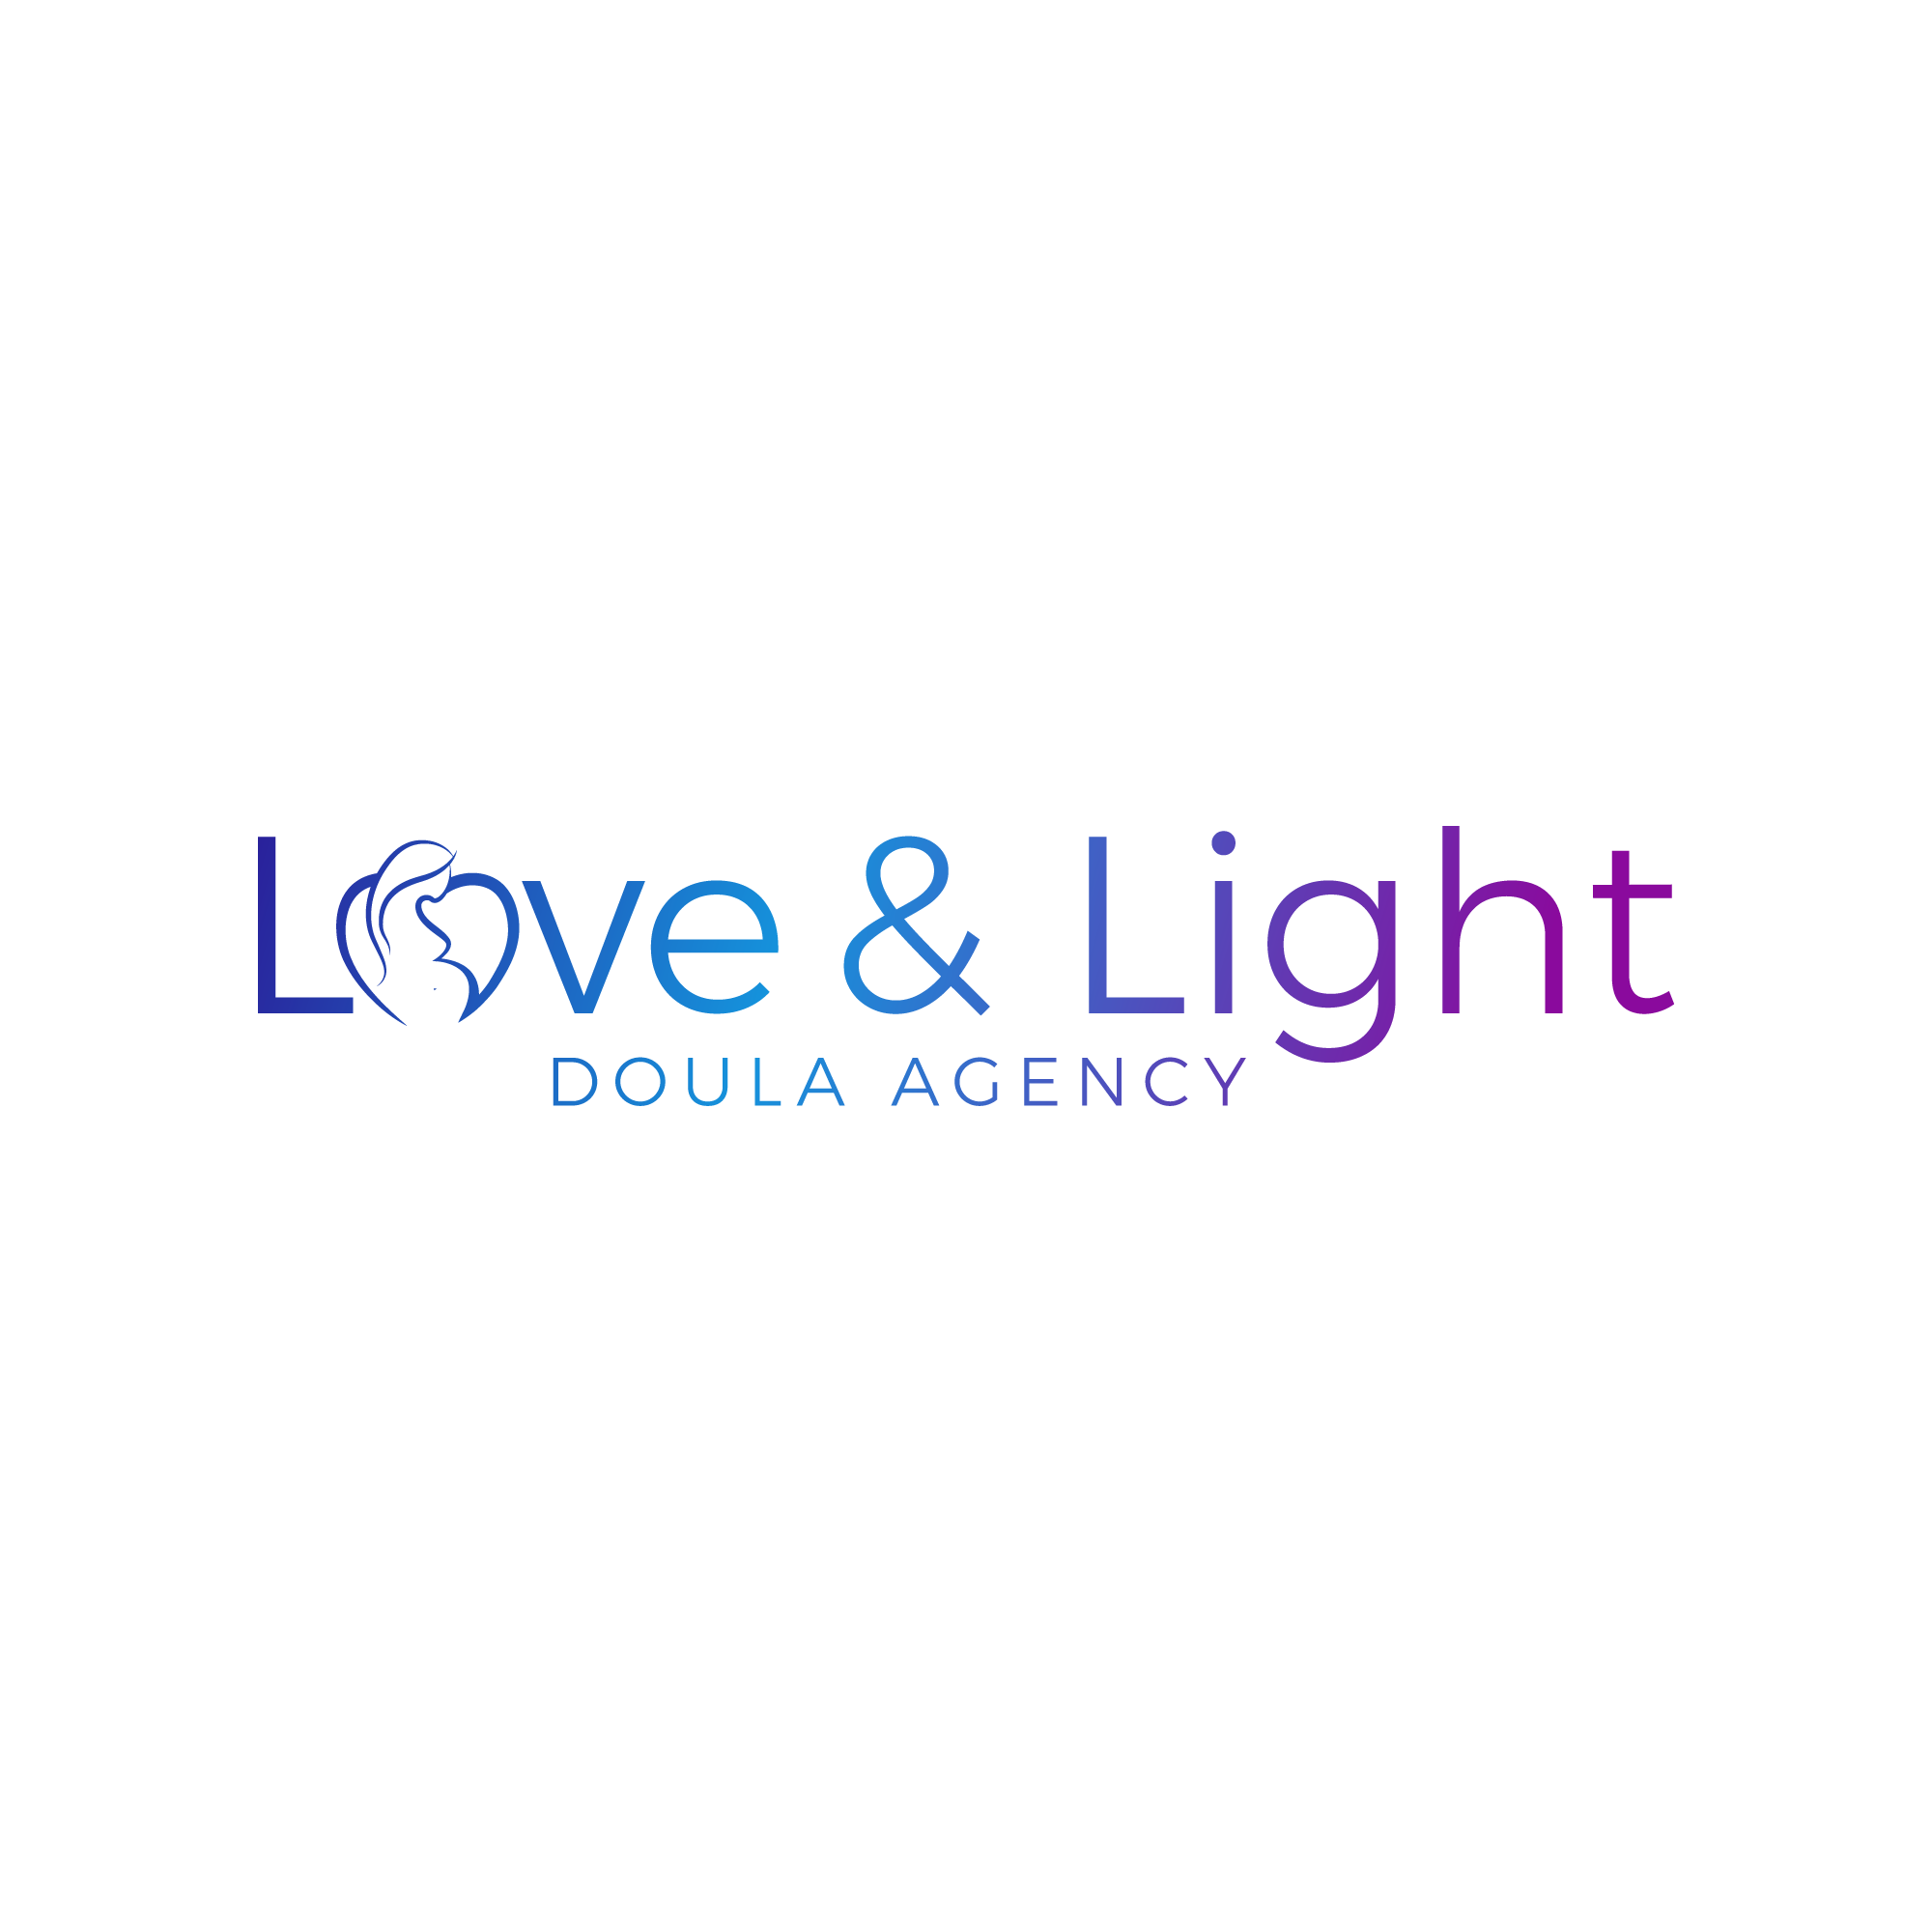 Love & Light Doula Agency